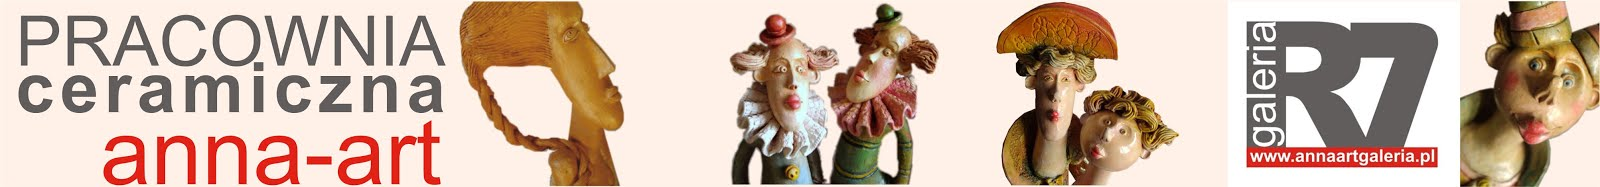 pracownia ceramiczna anna-art